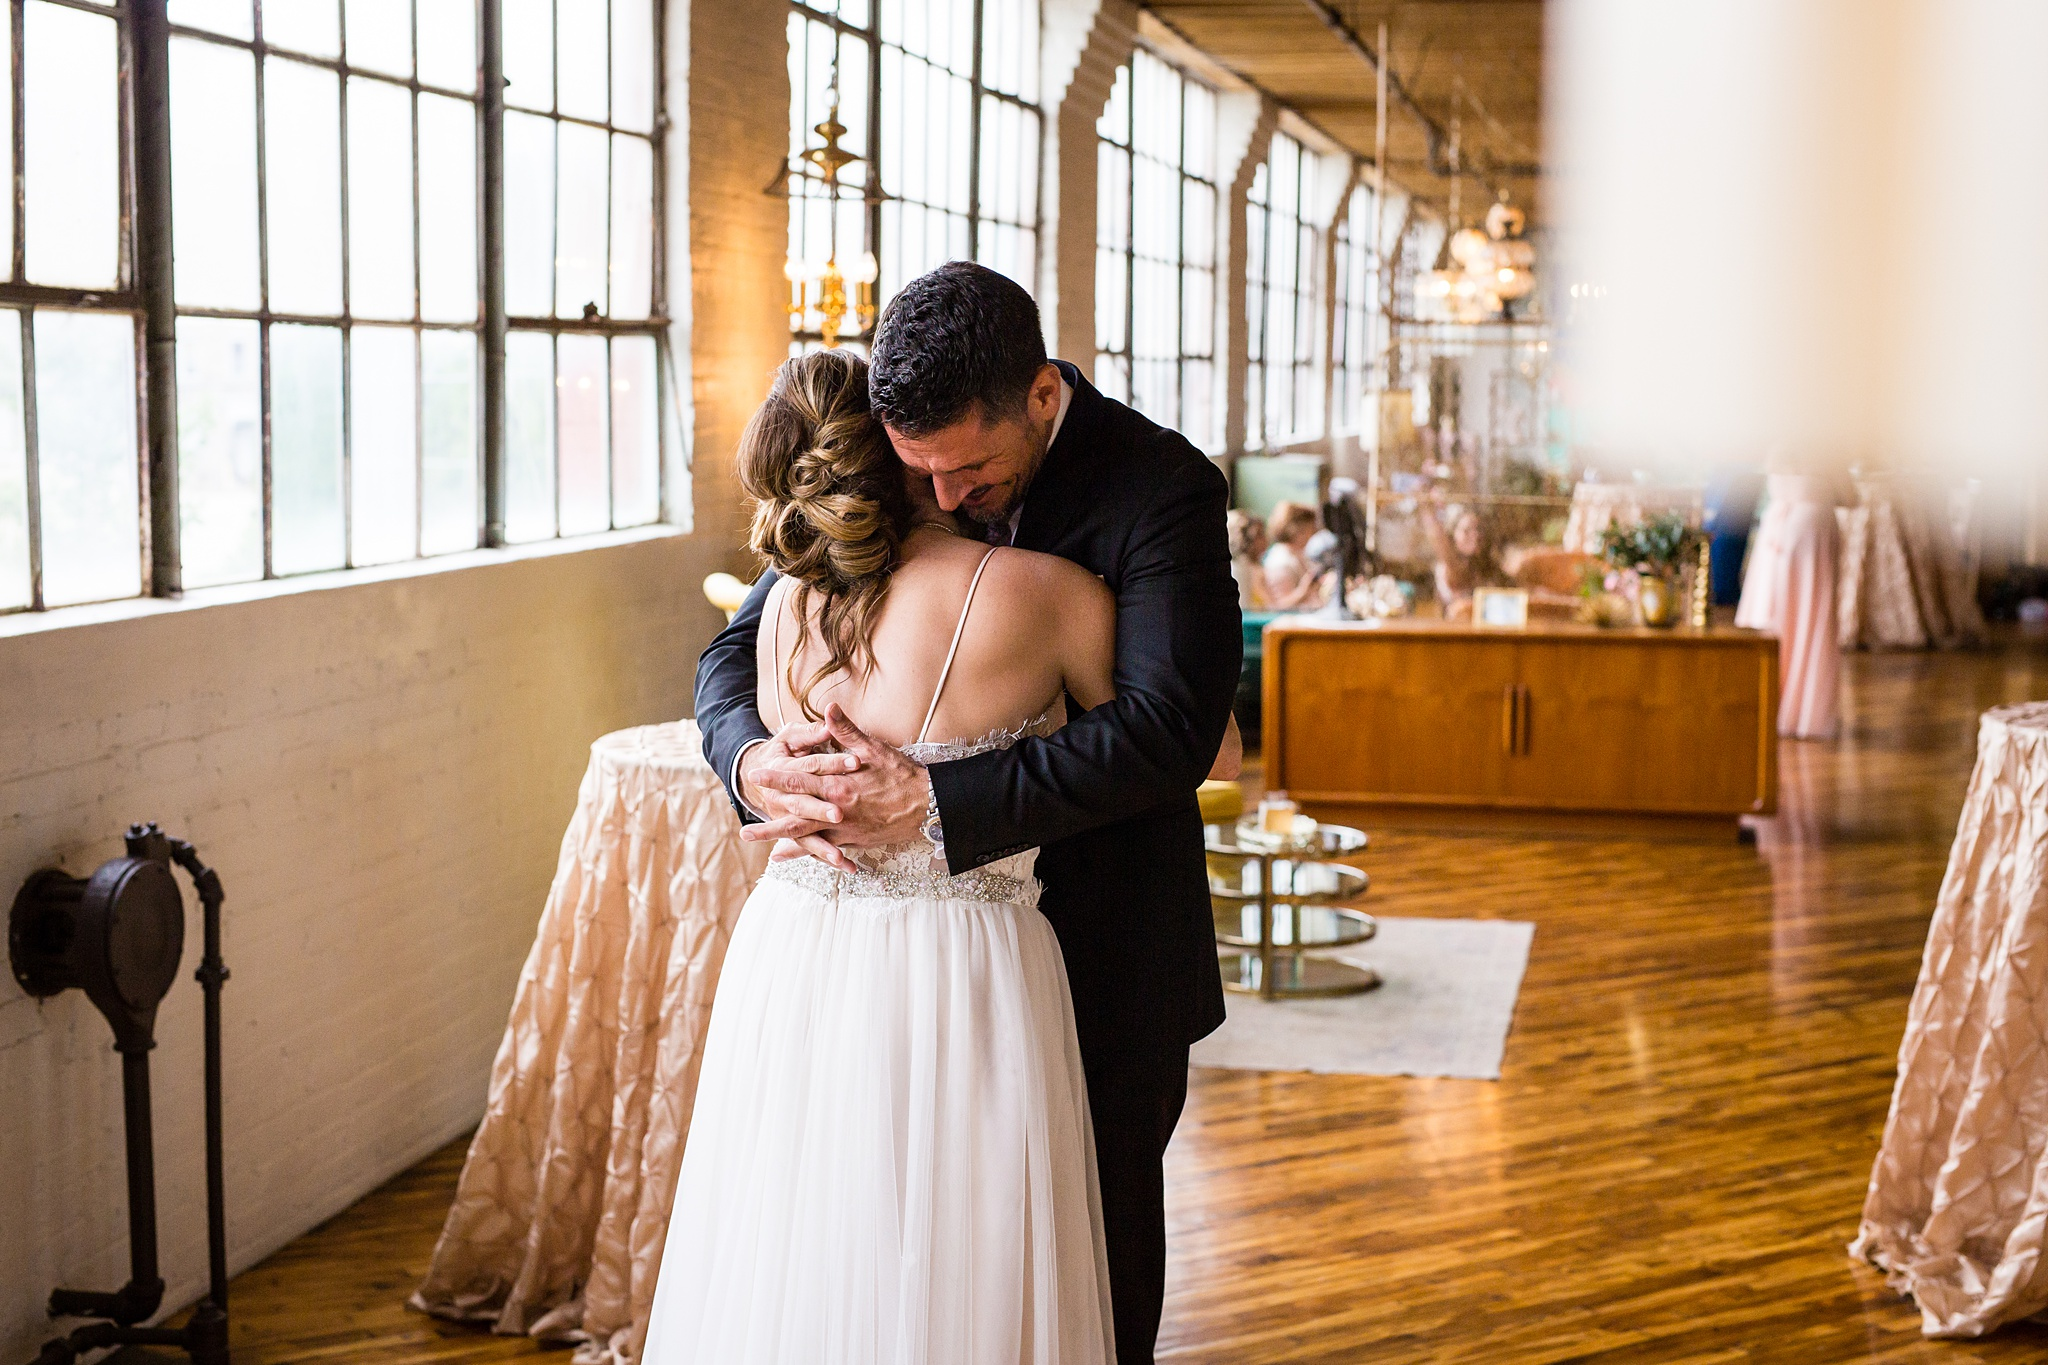 Meghan_Drew_Grand_Rapids_Cheney_place_Wedding020.JPG